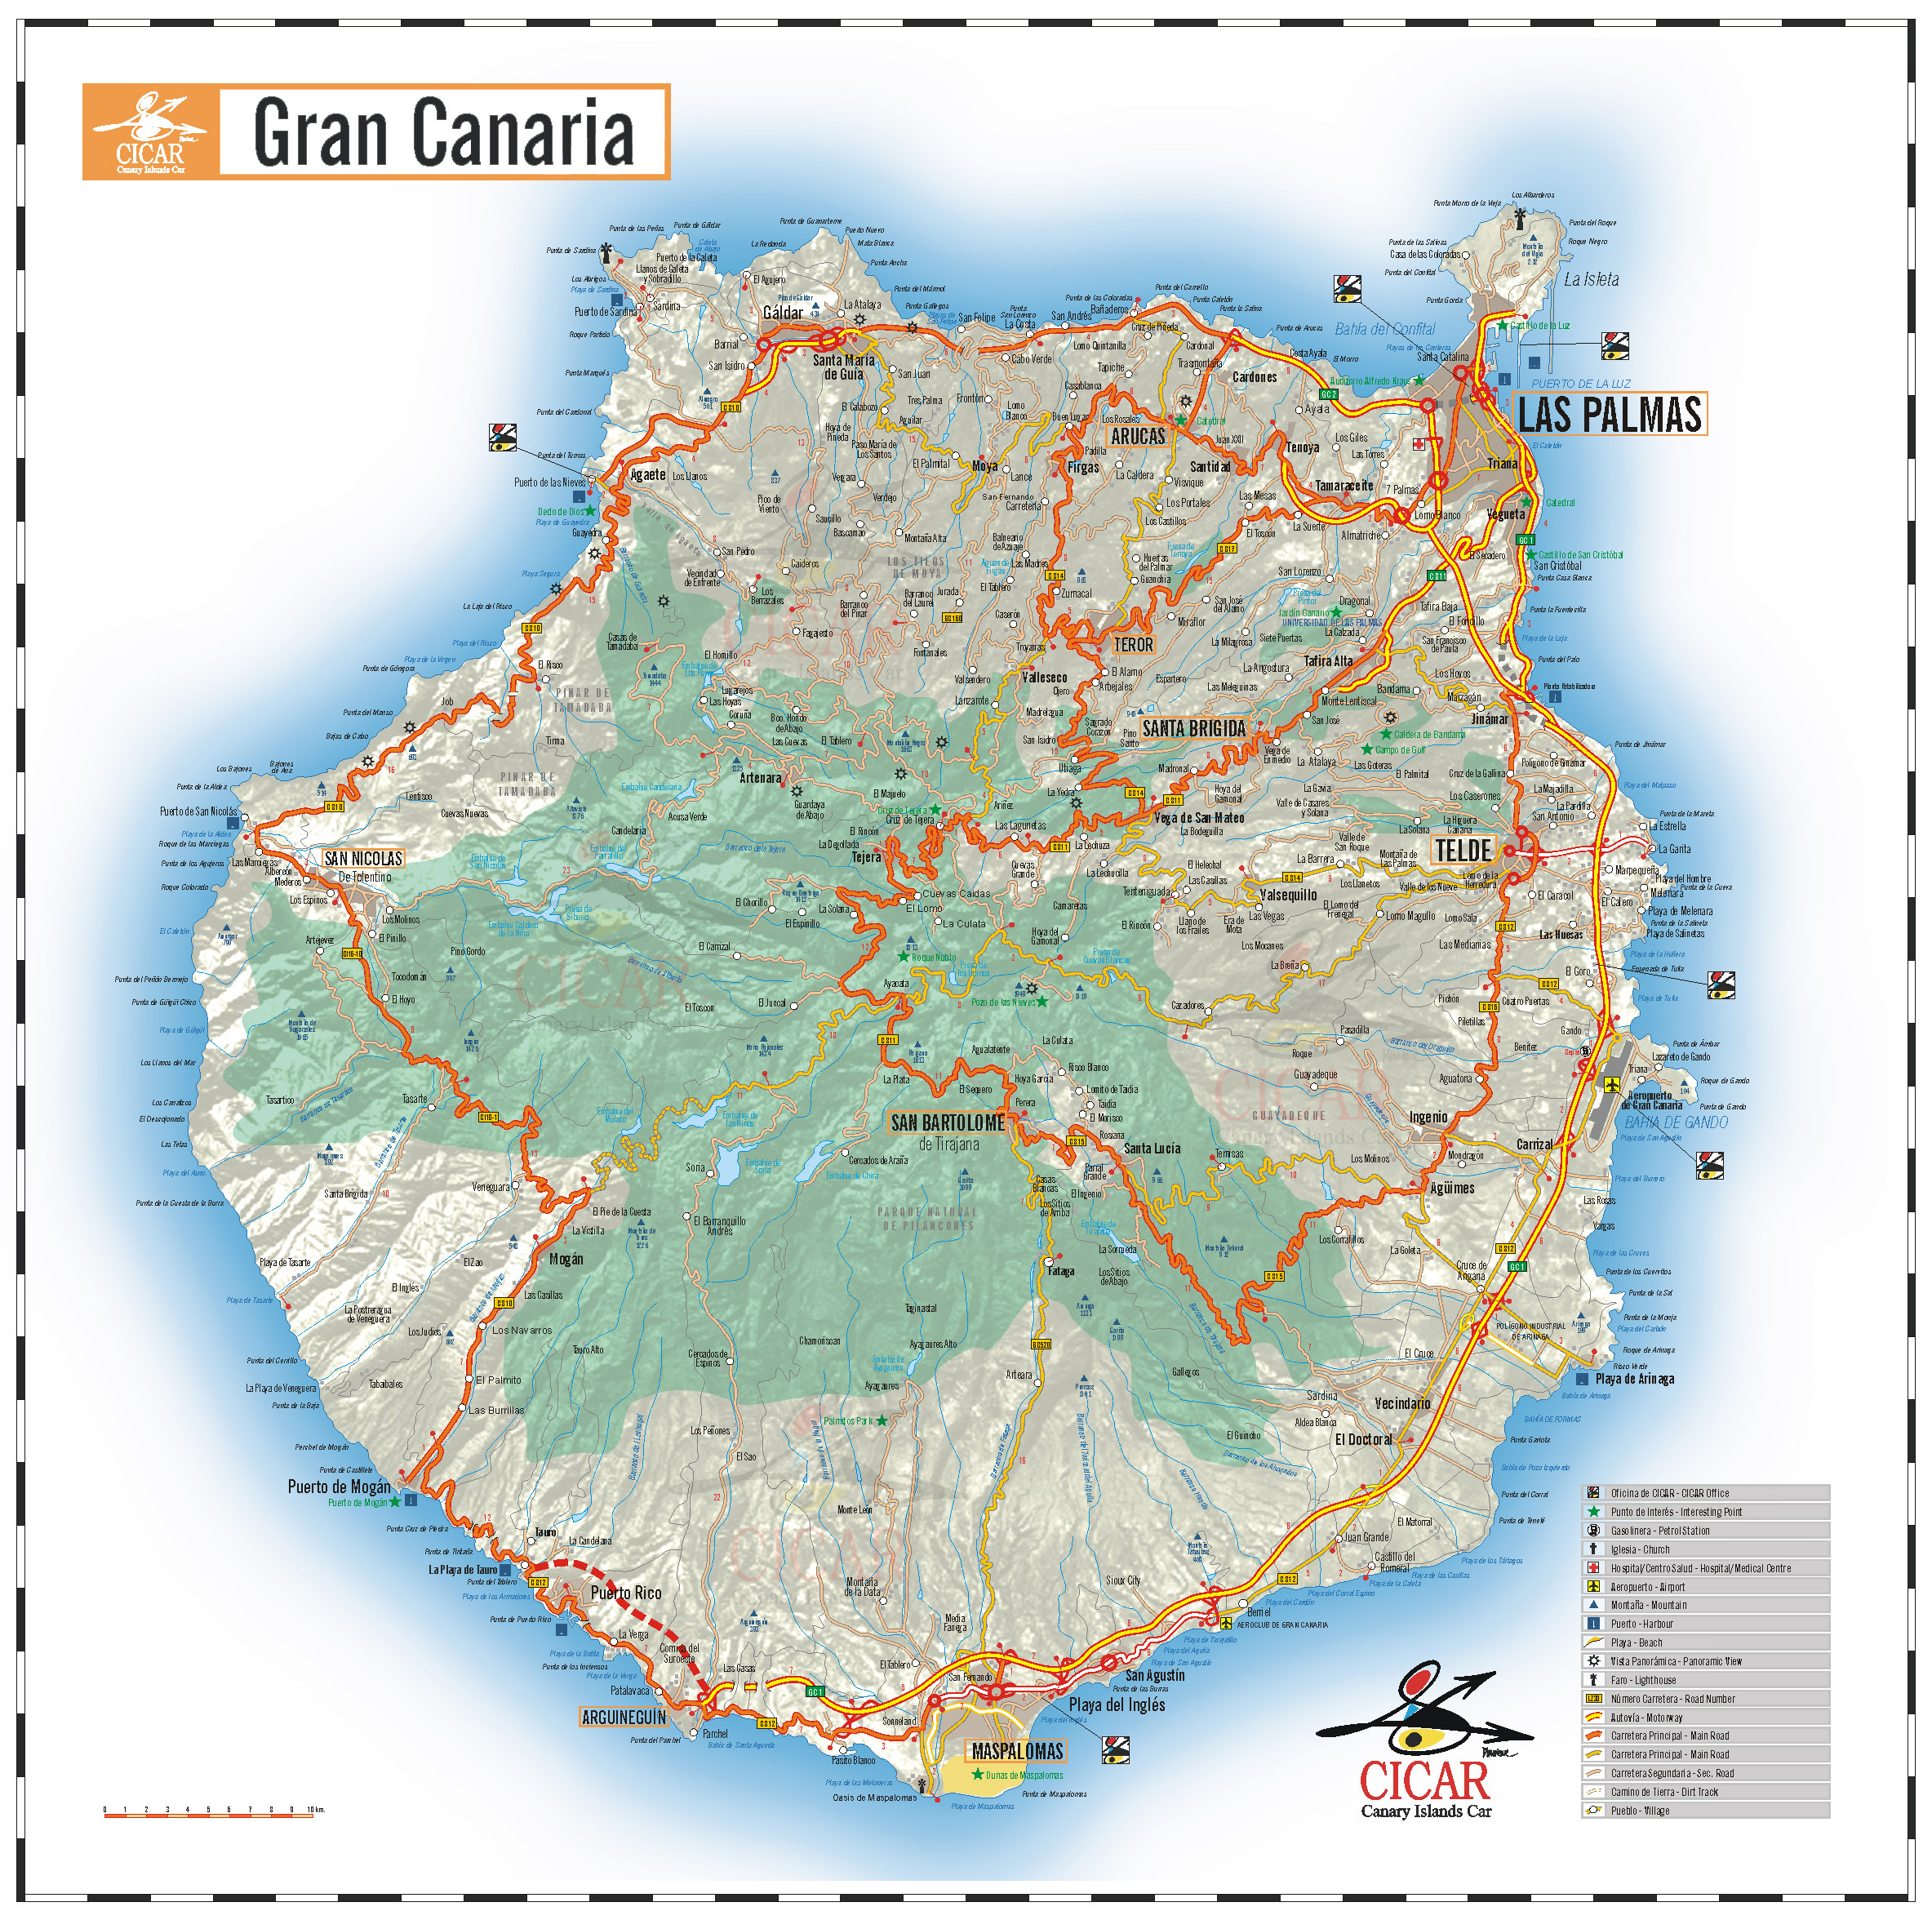 Cartograf.fr : L'Espagne : Les iles Canaries : Grande Canarie